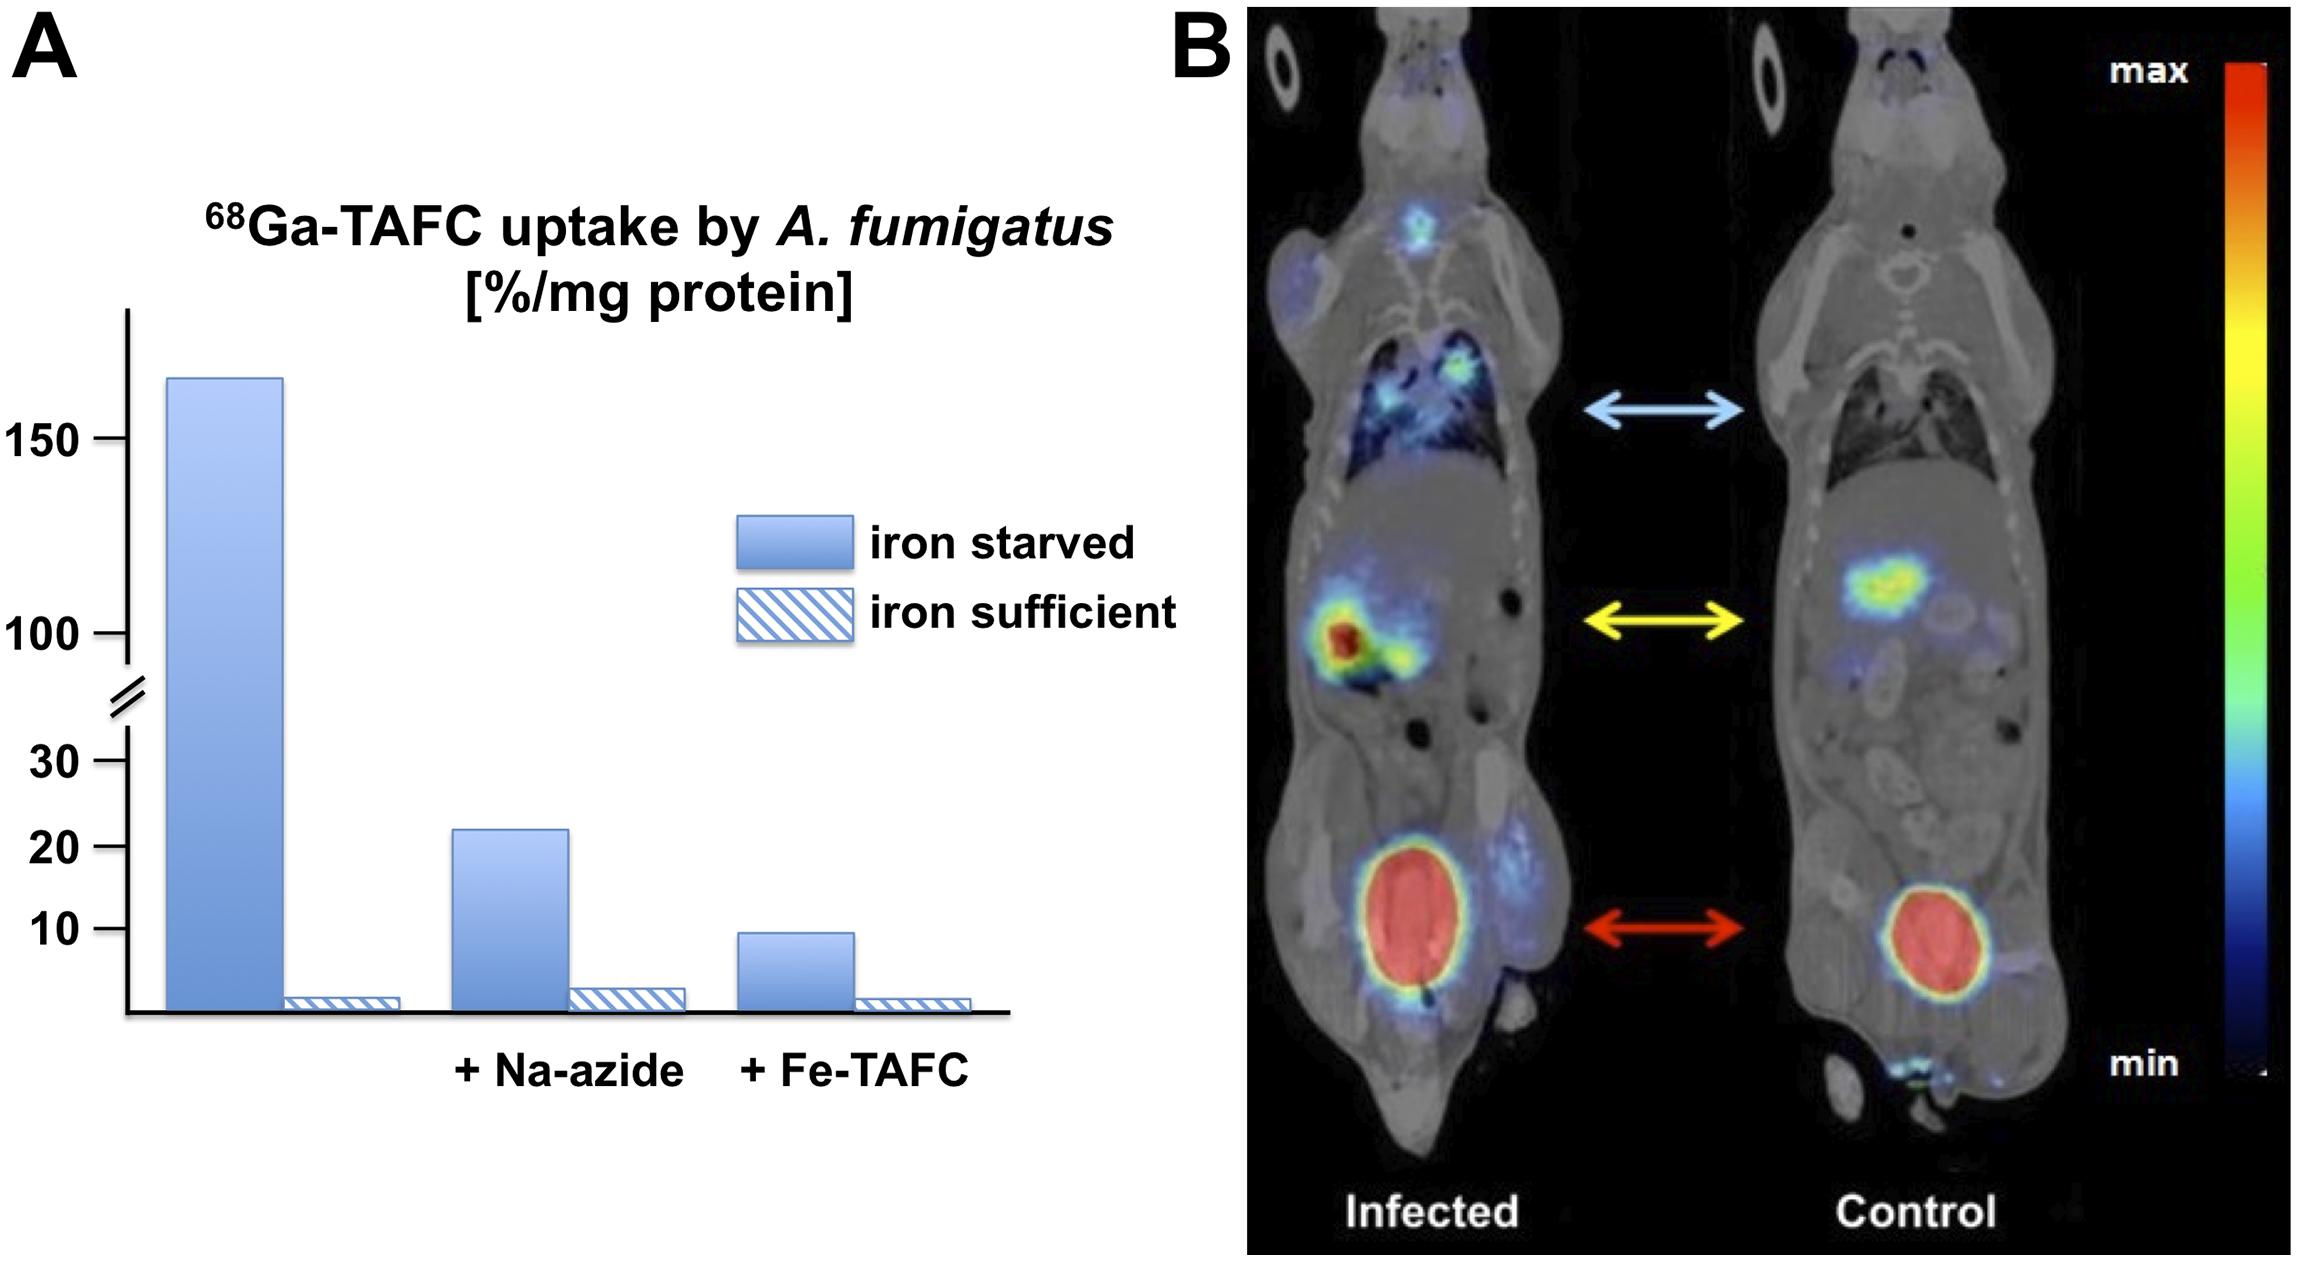 In vitro and in vivo uptake of <sup>68</sup>Ga-TAFC by <i>A. fumigatus</i>.